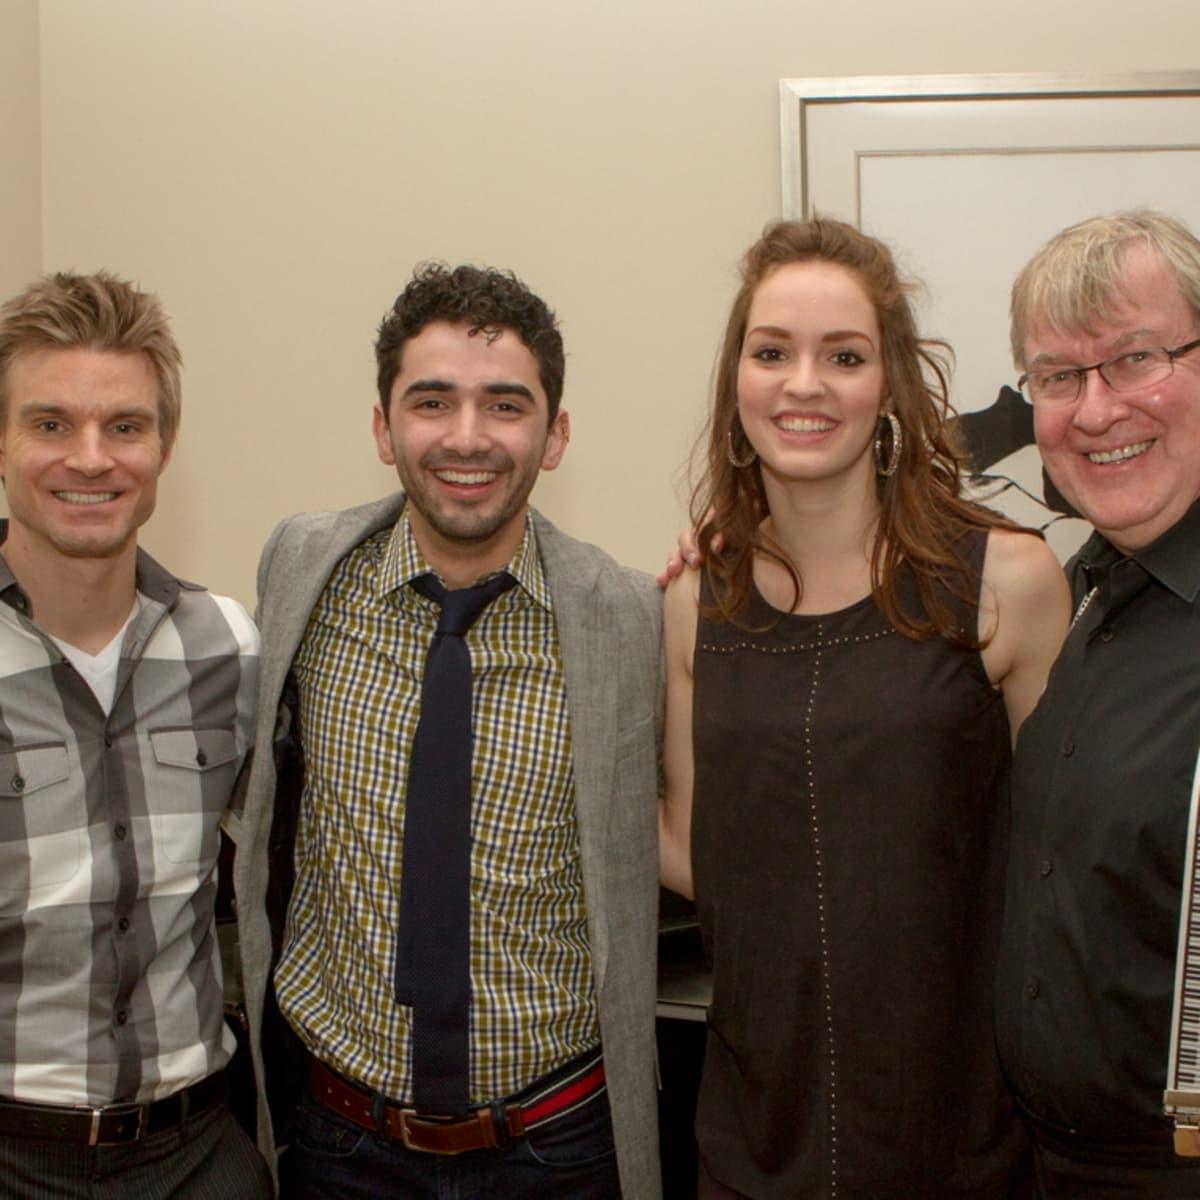 UT Music Fundraiser Timothy Boaz, Christopher Montalvo, Emma Center, Marshall Maxwell